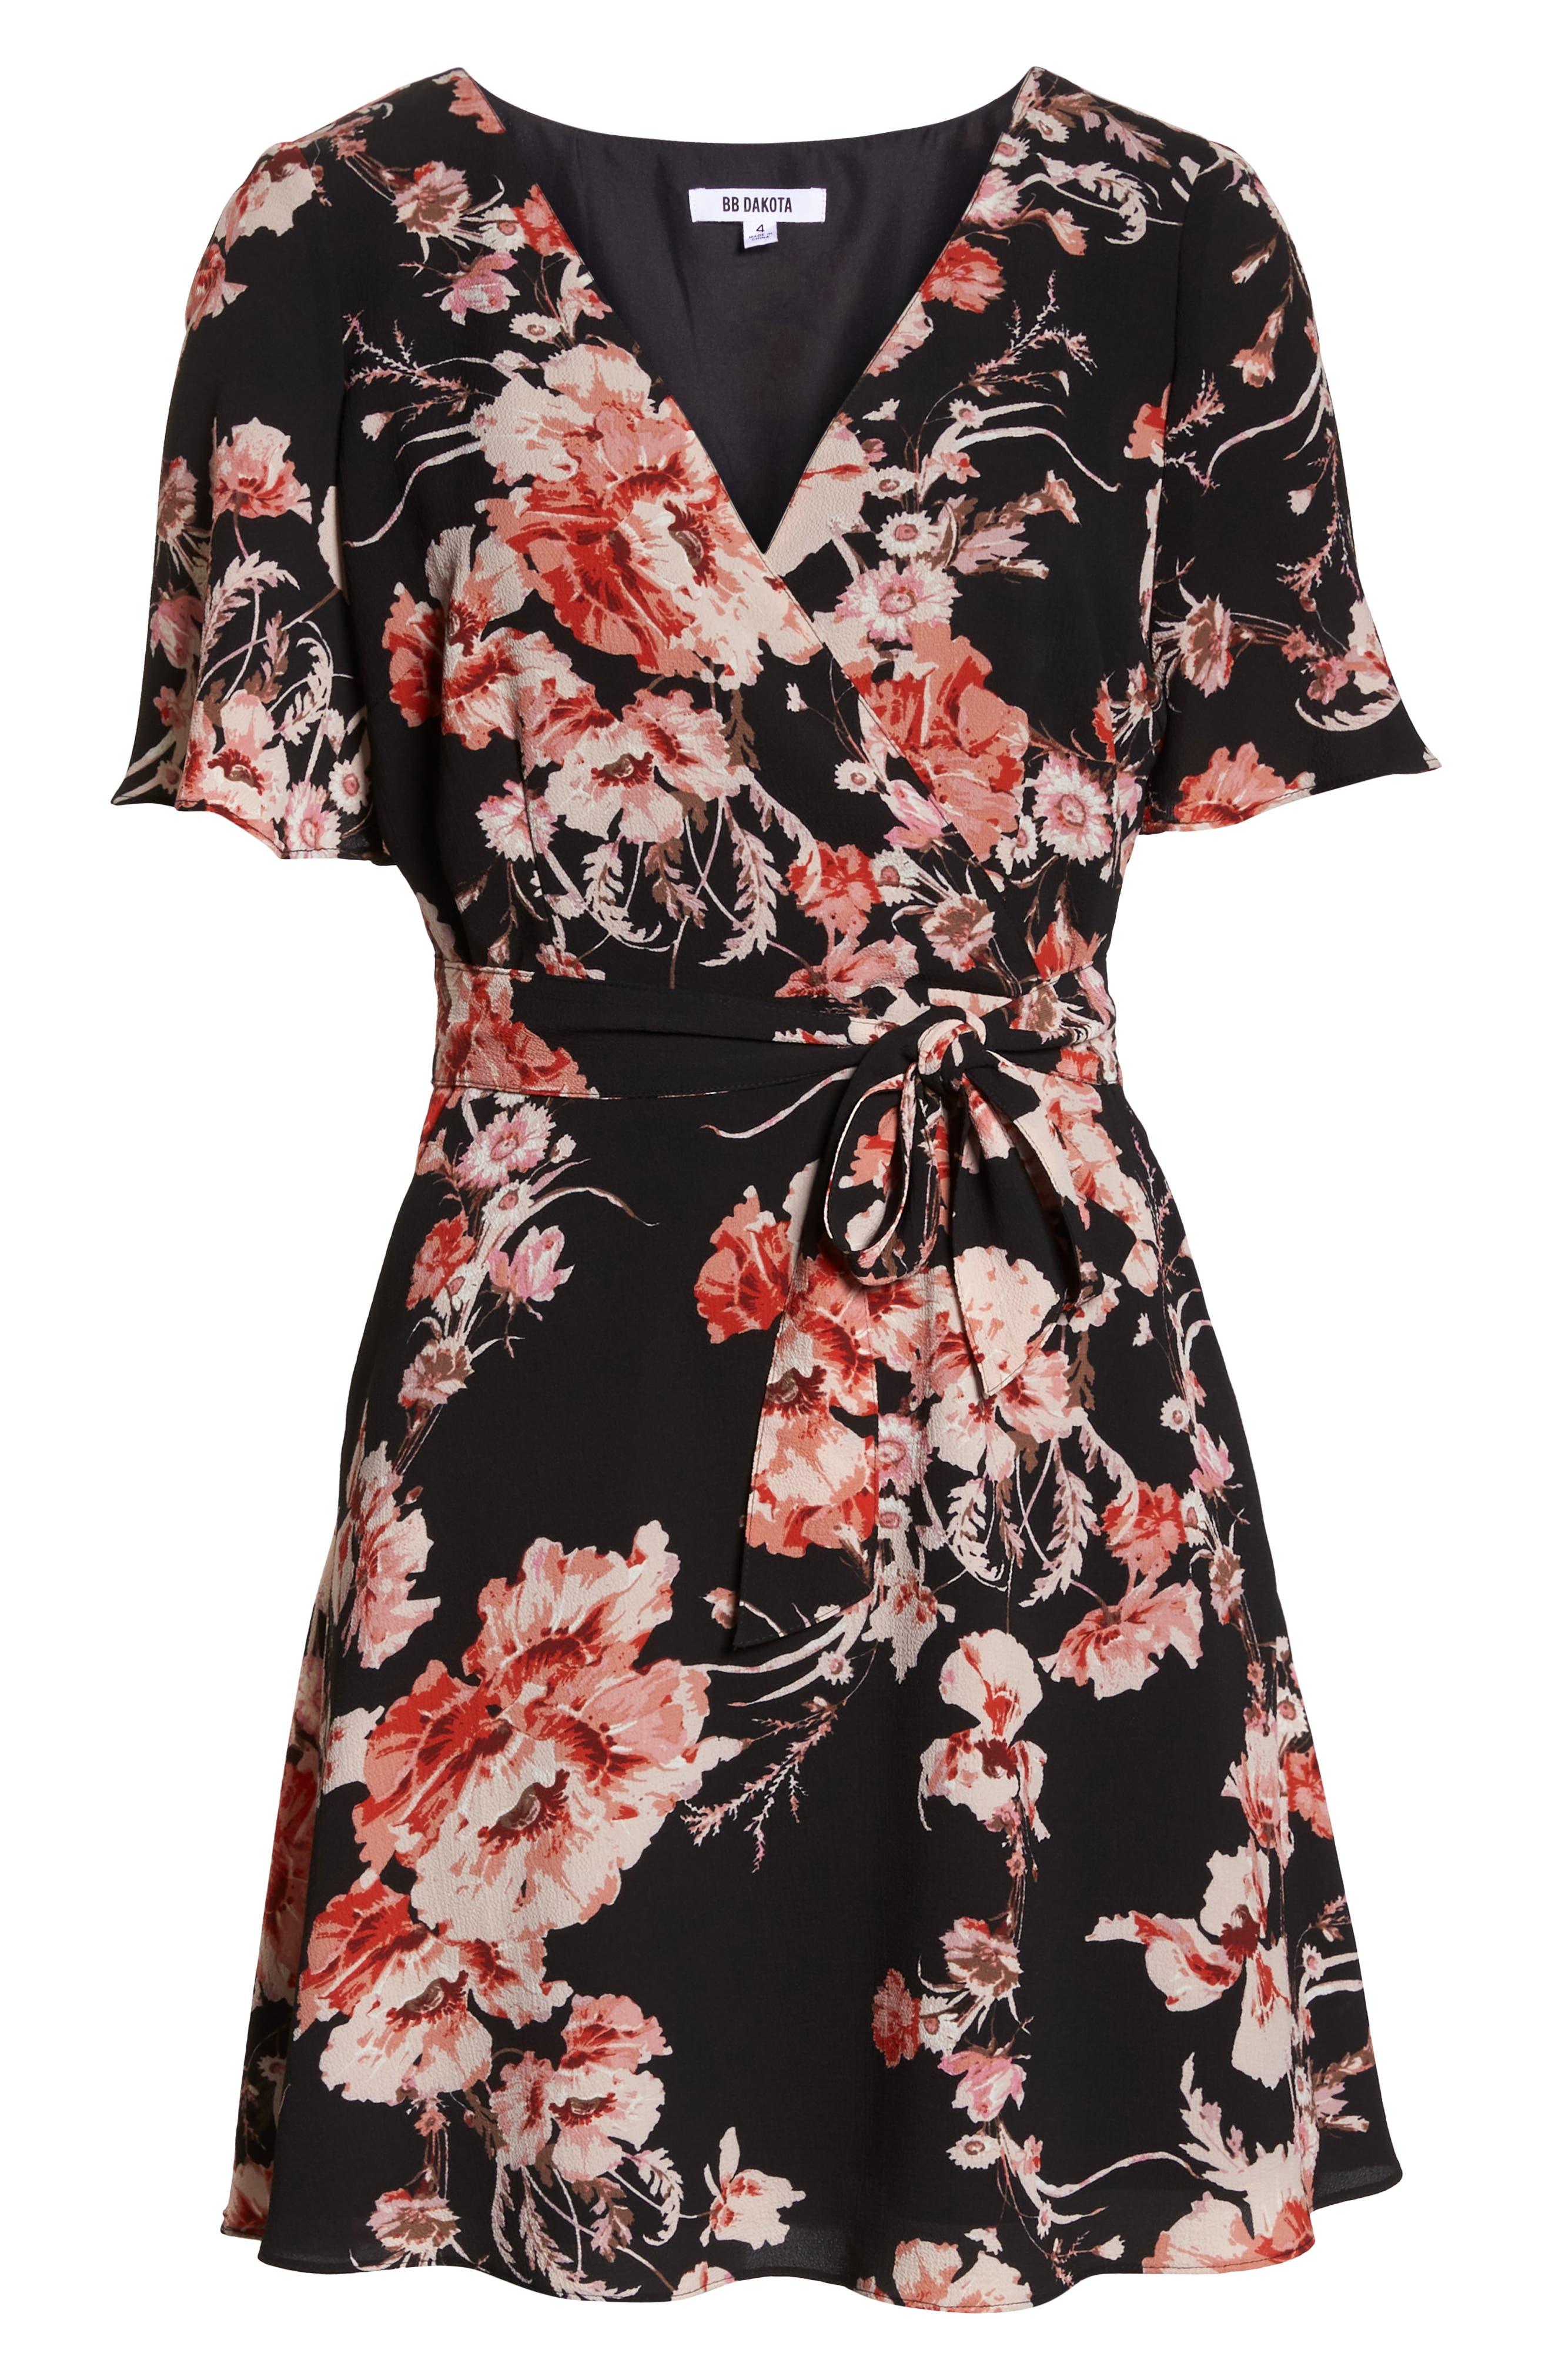 BB DAKOTA,                             Wait Until Dark Floral Dress,                             Alternate thumbnail 7, color,                             001